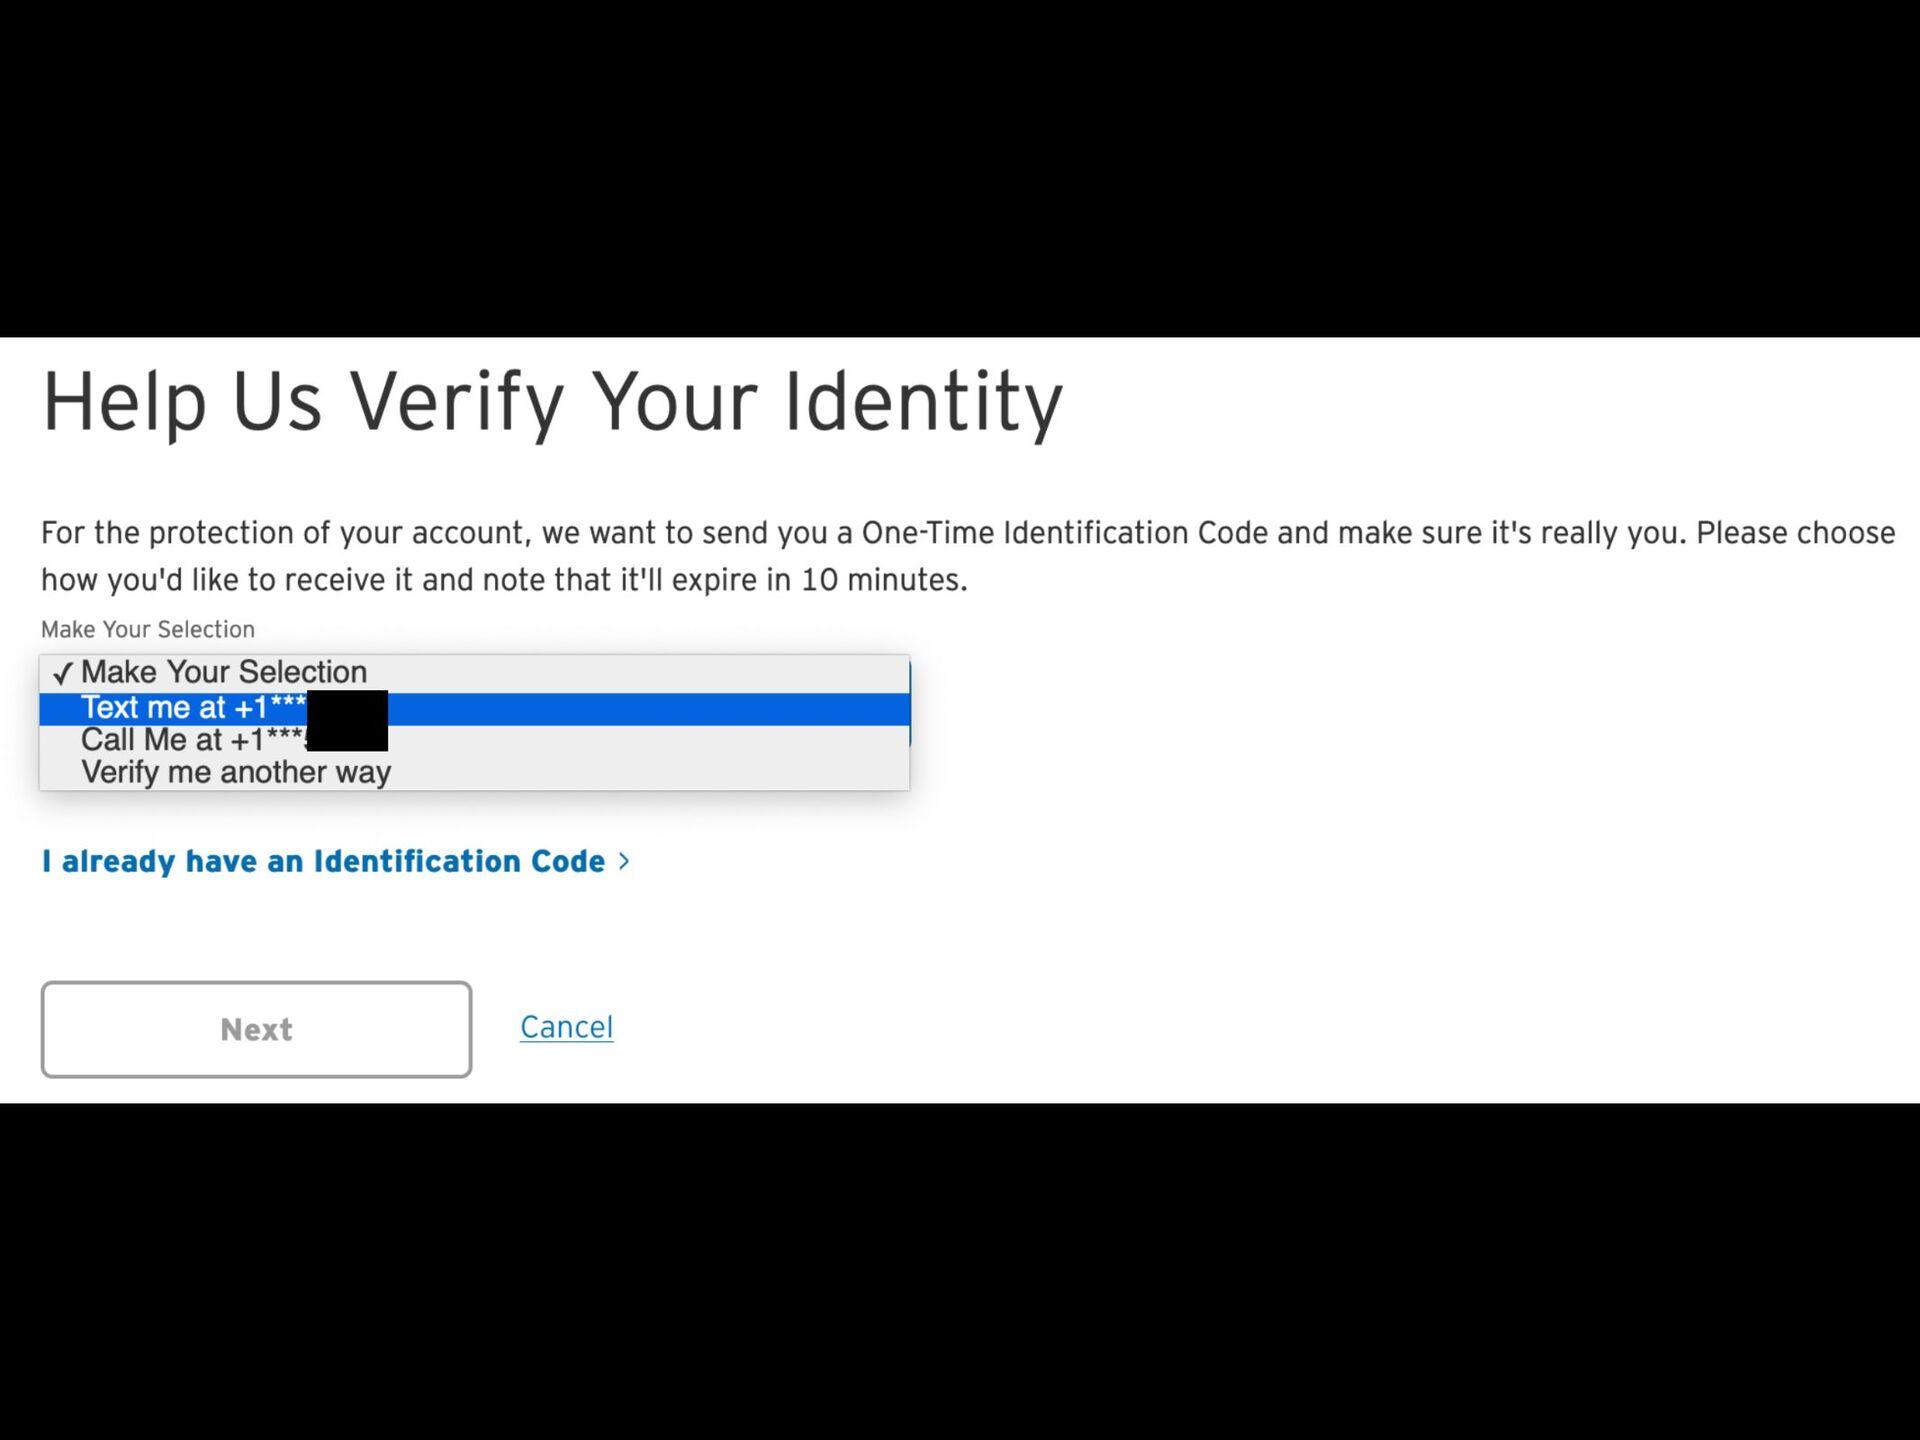 8c. Use 2-Factor Authentication (2FA)